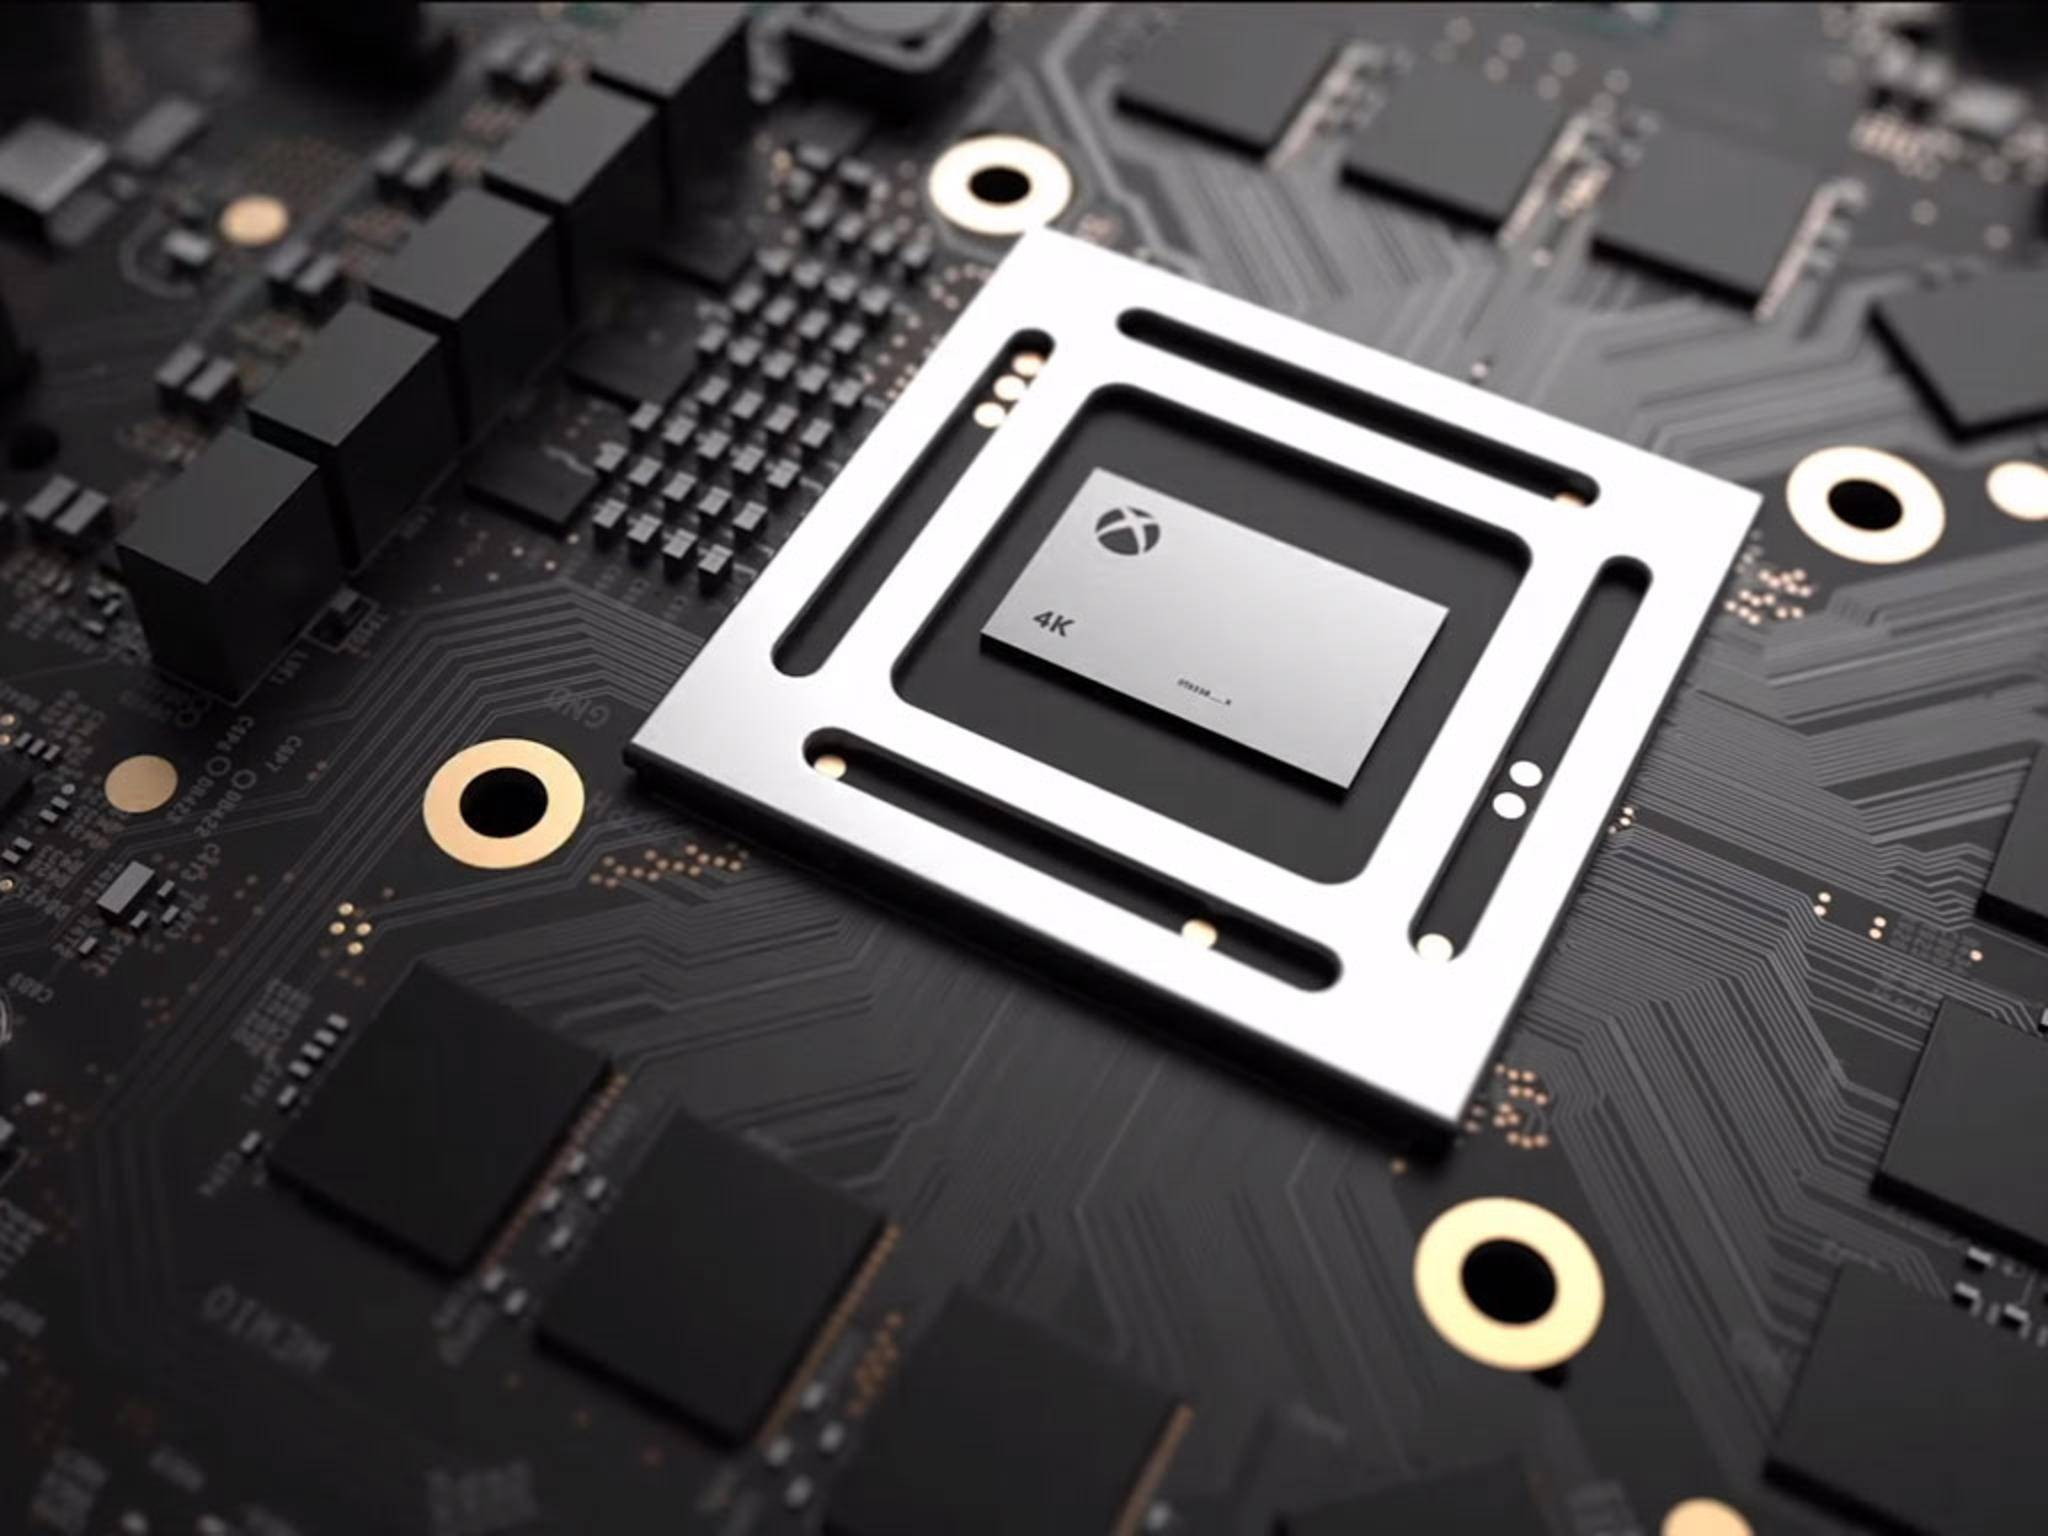 Wird die Xbox One Scorpio Microsofts letzt Konsole?